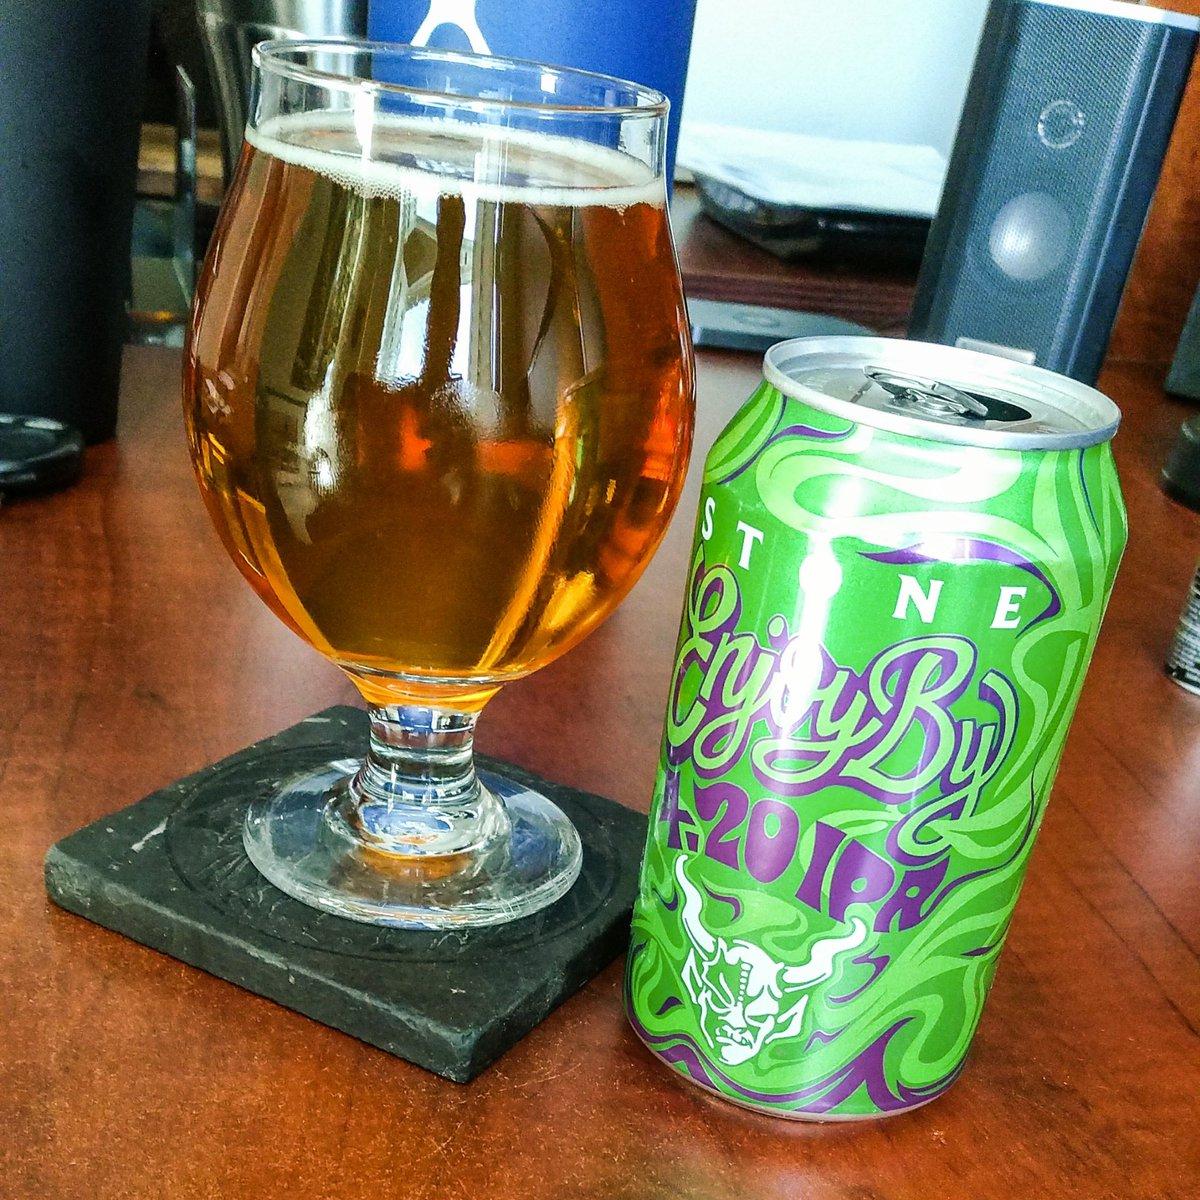 And enjoying an adult beverage.   #craftbeer pic.twitter.com/3EZfNfoQtX